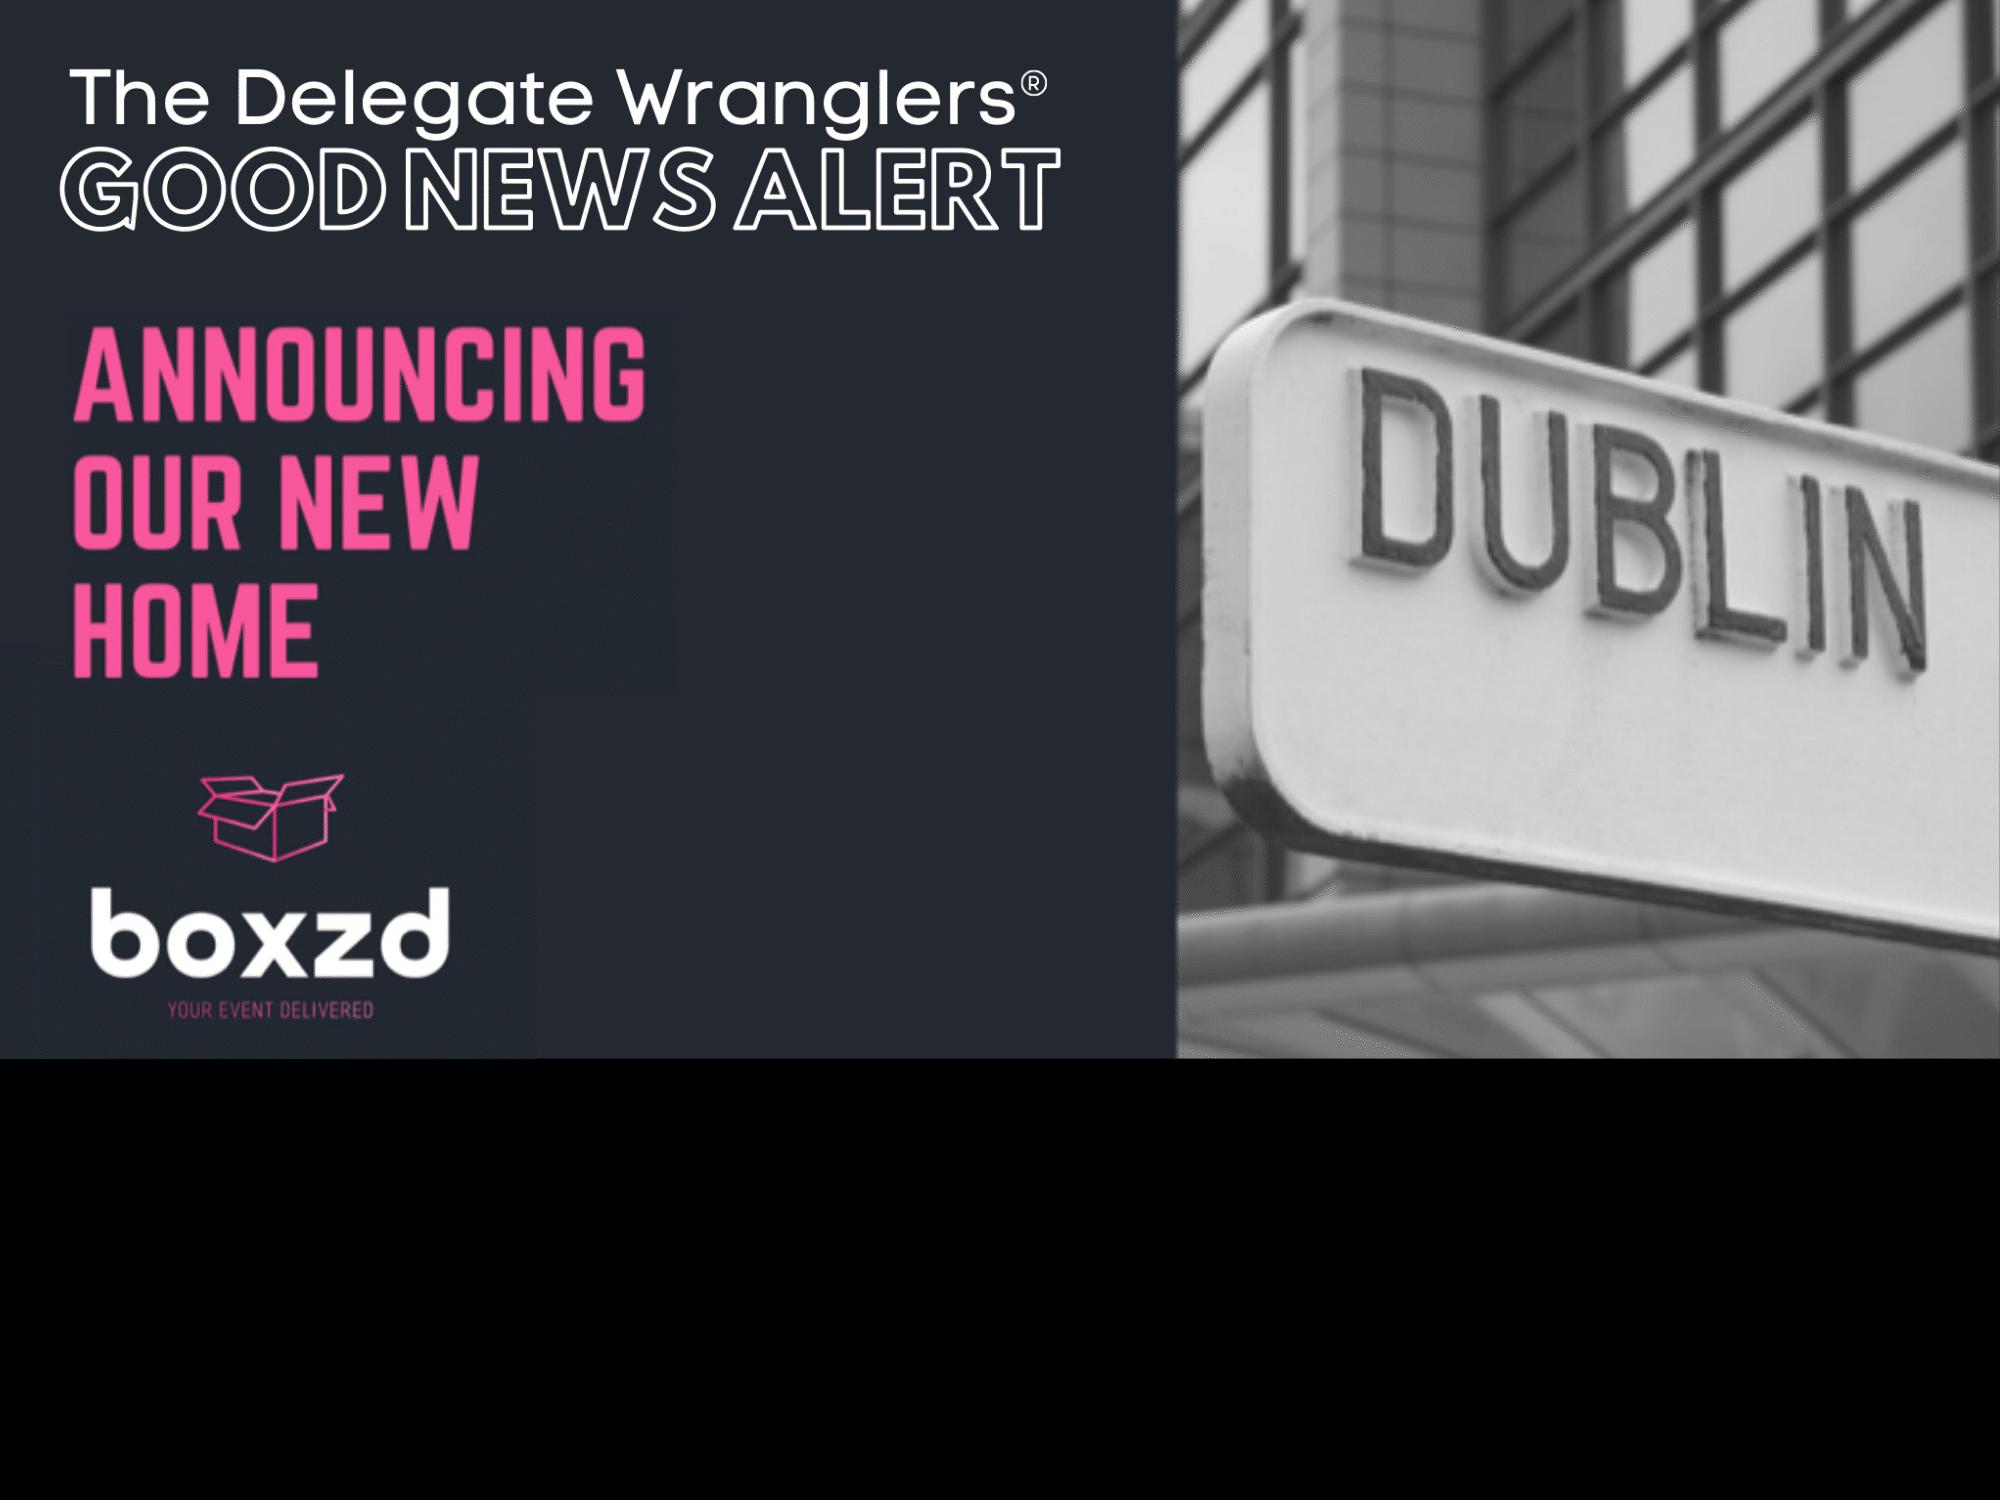 BOXZD launch new base in Dublin